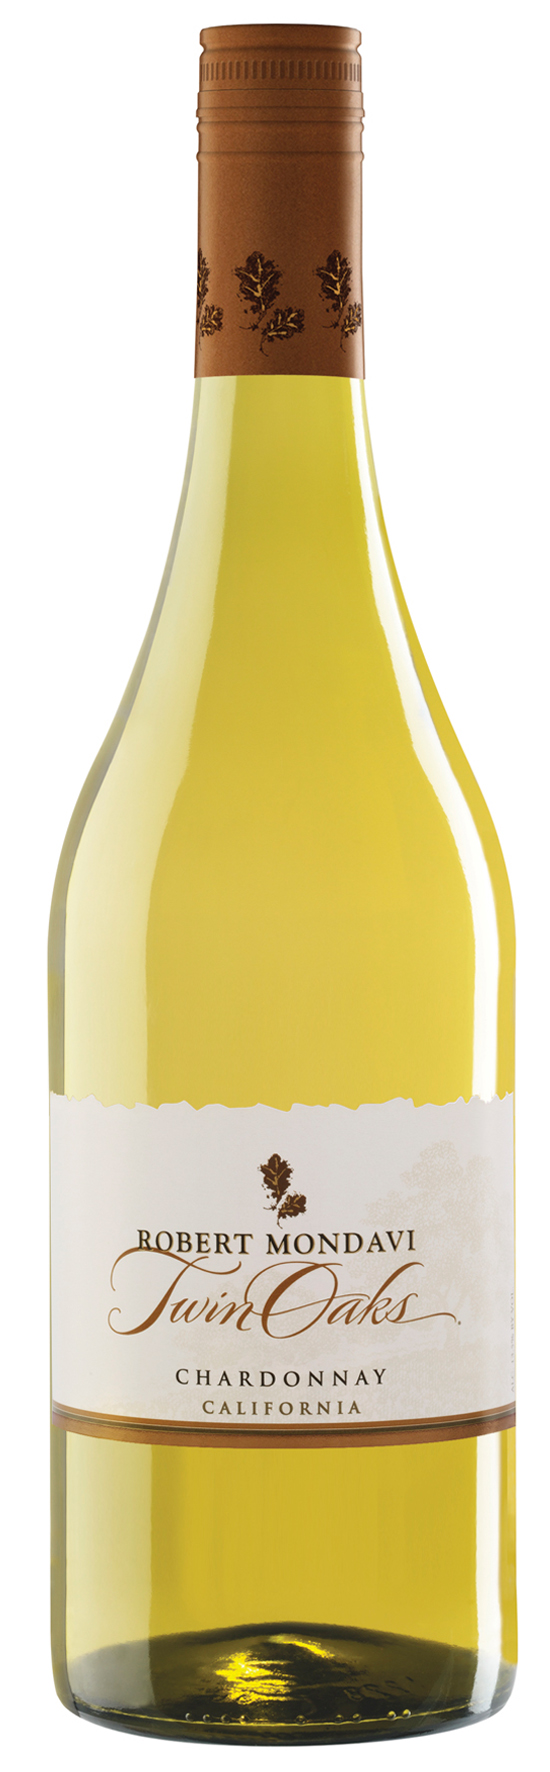 Robert Mondavi Twin Oaks Chardonnay California (2018)